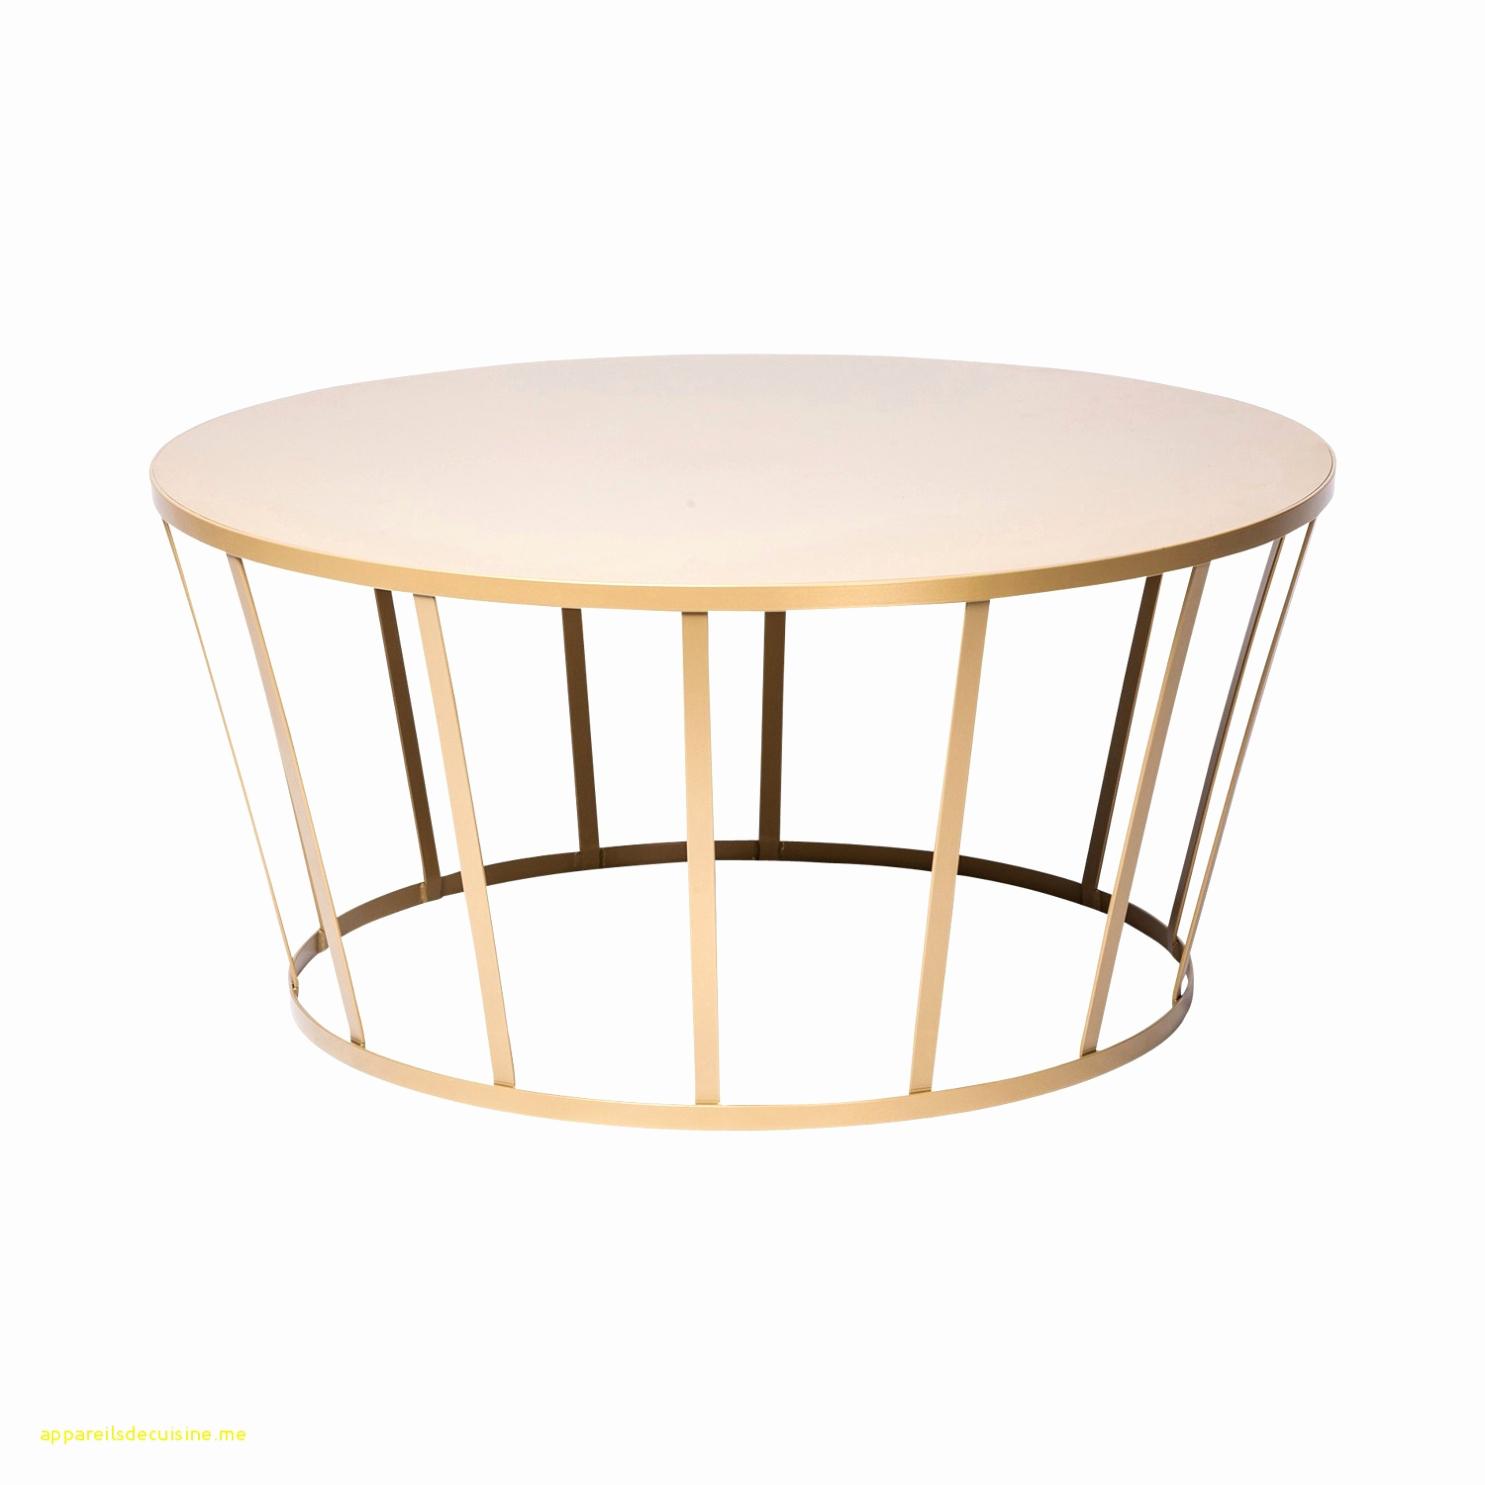 Table Basse Camif Inspirant Photos Table Basse Marbre Design Beau Maha De Table Ronde Basse Mahagranda